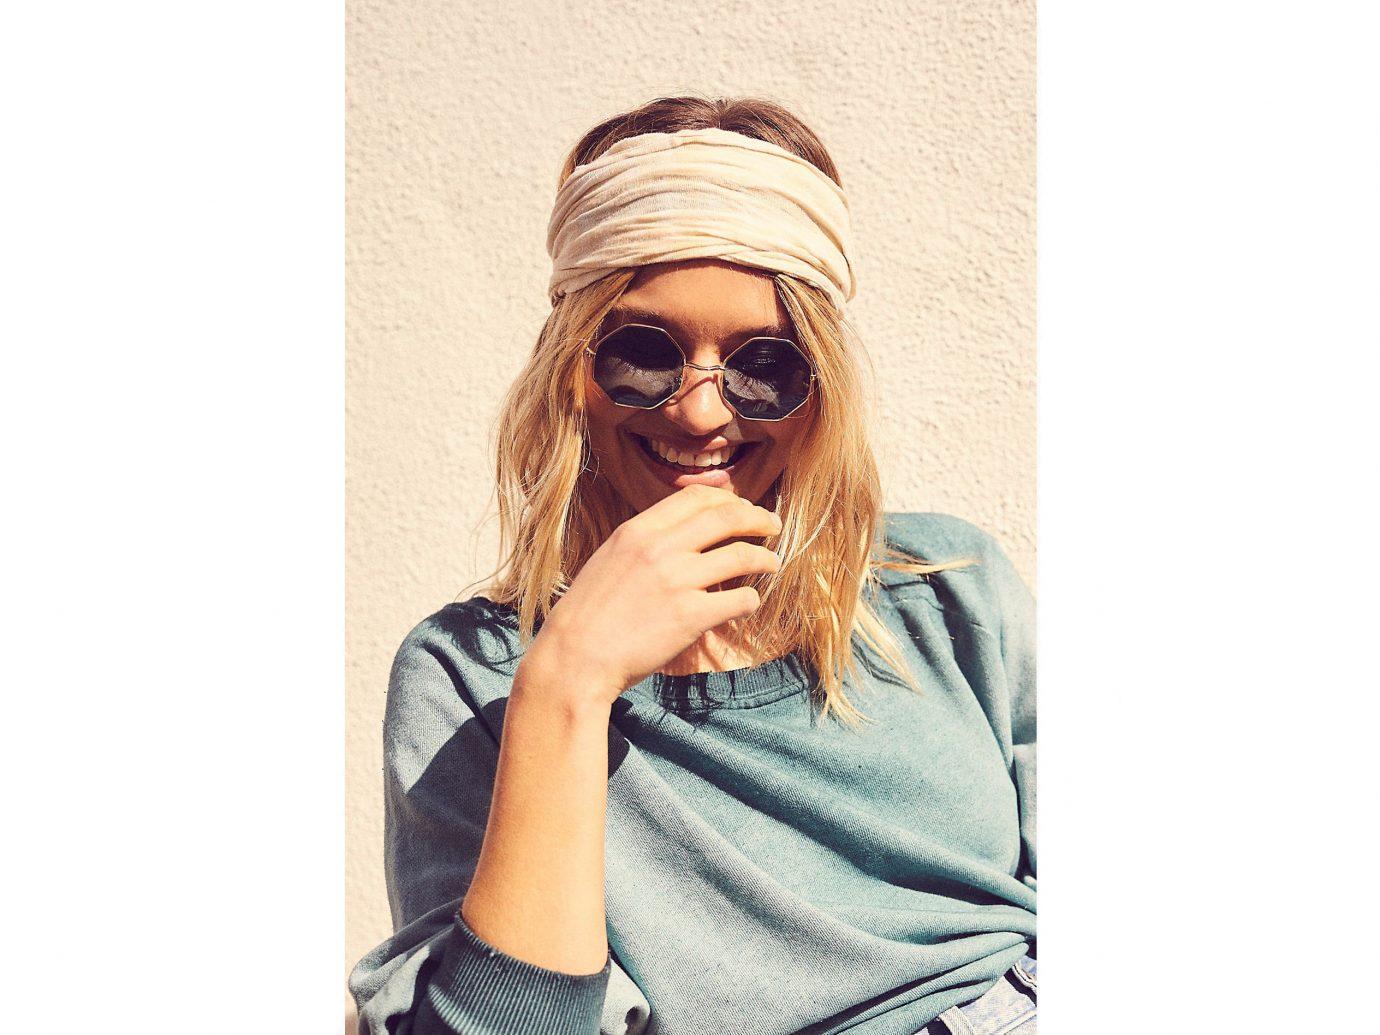 Trip Ideas person eyewear wearing hair accessory headgear fashion accessory vision care sunglasses cap beanie glasses hat